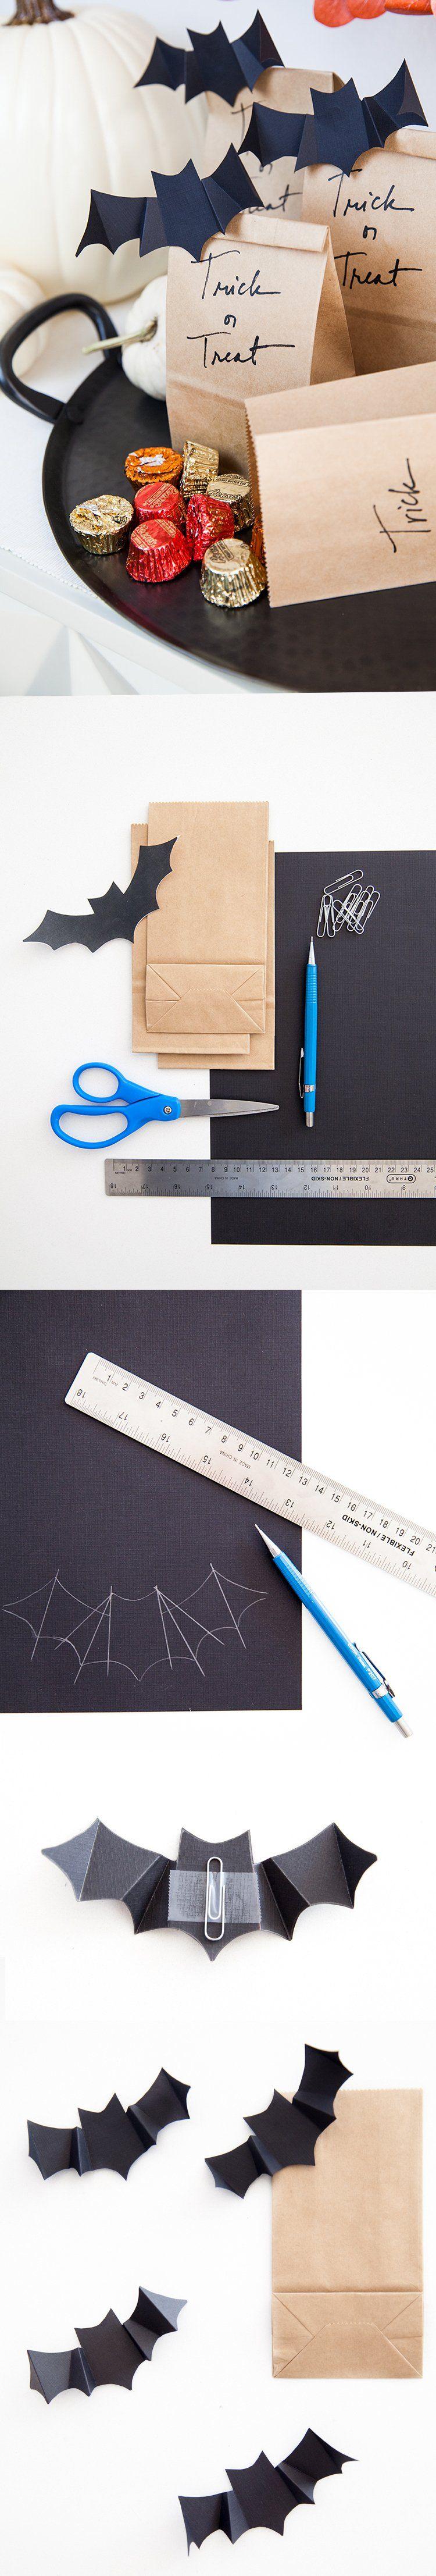 free printable halloween bat how to - Blue Magic Born On Halloween